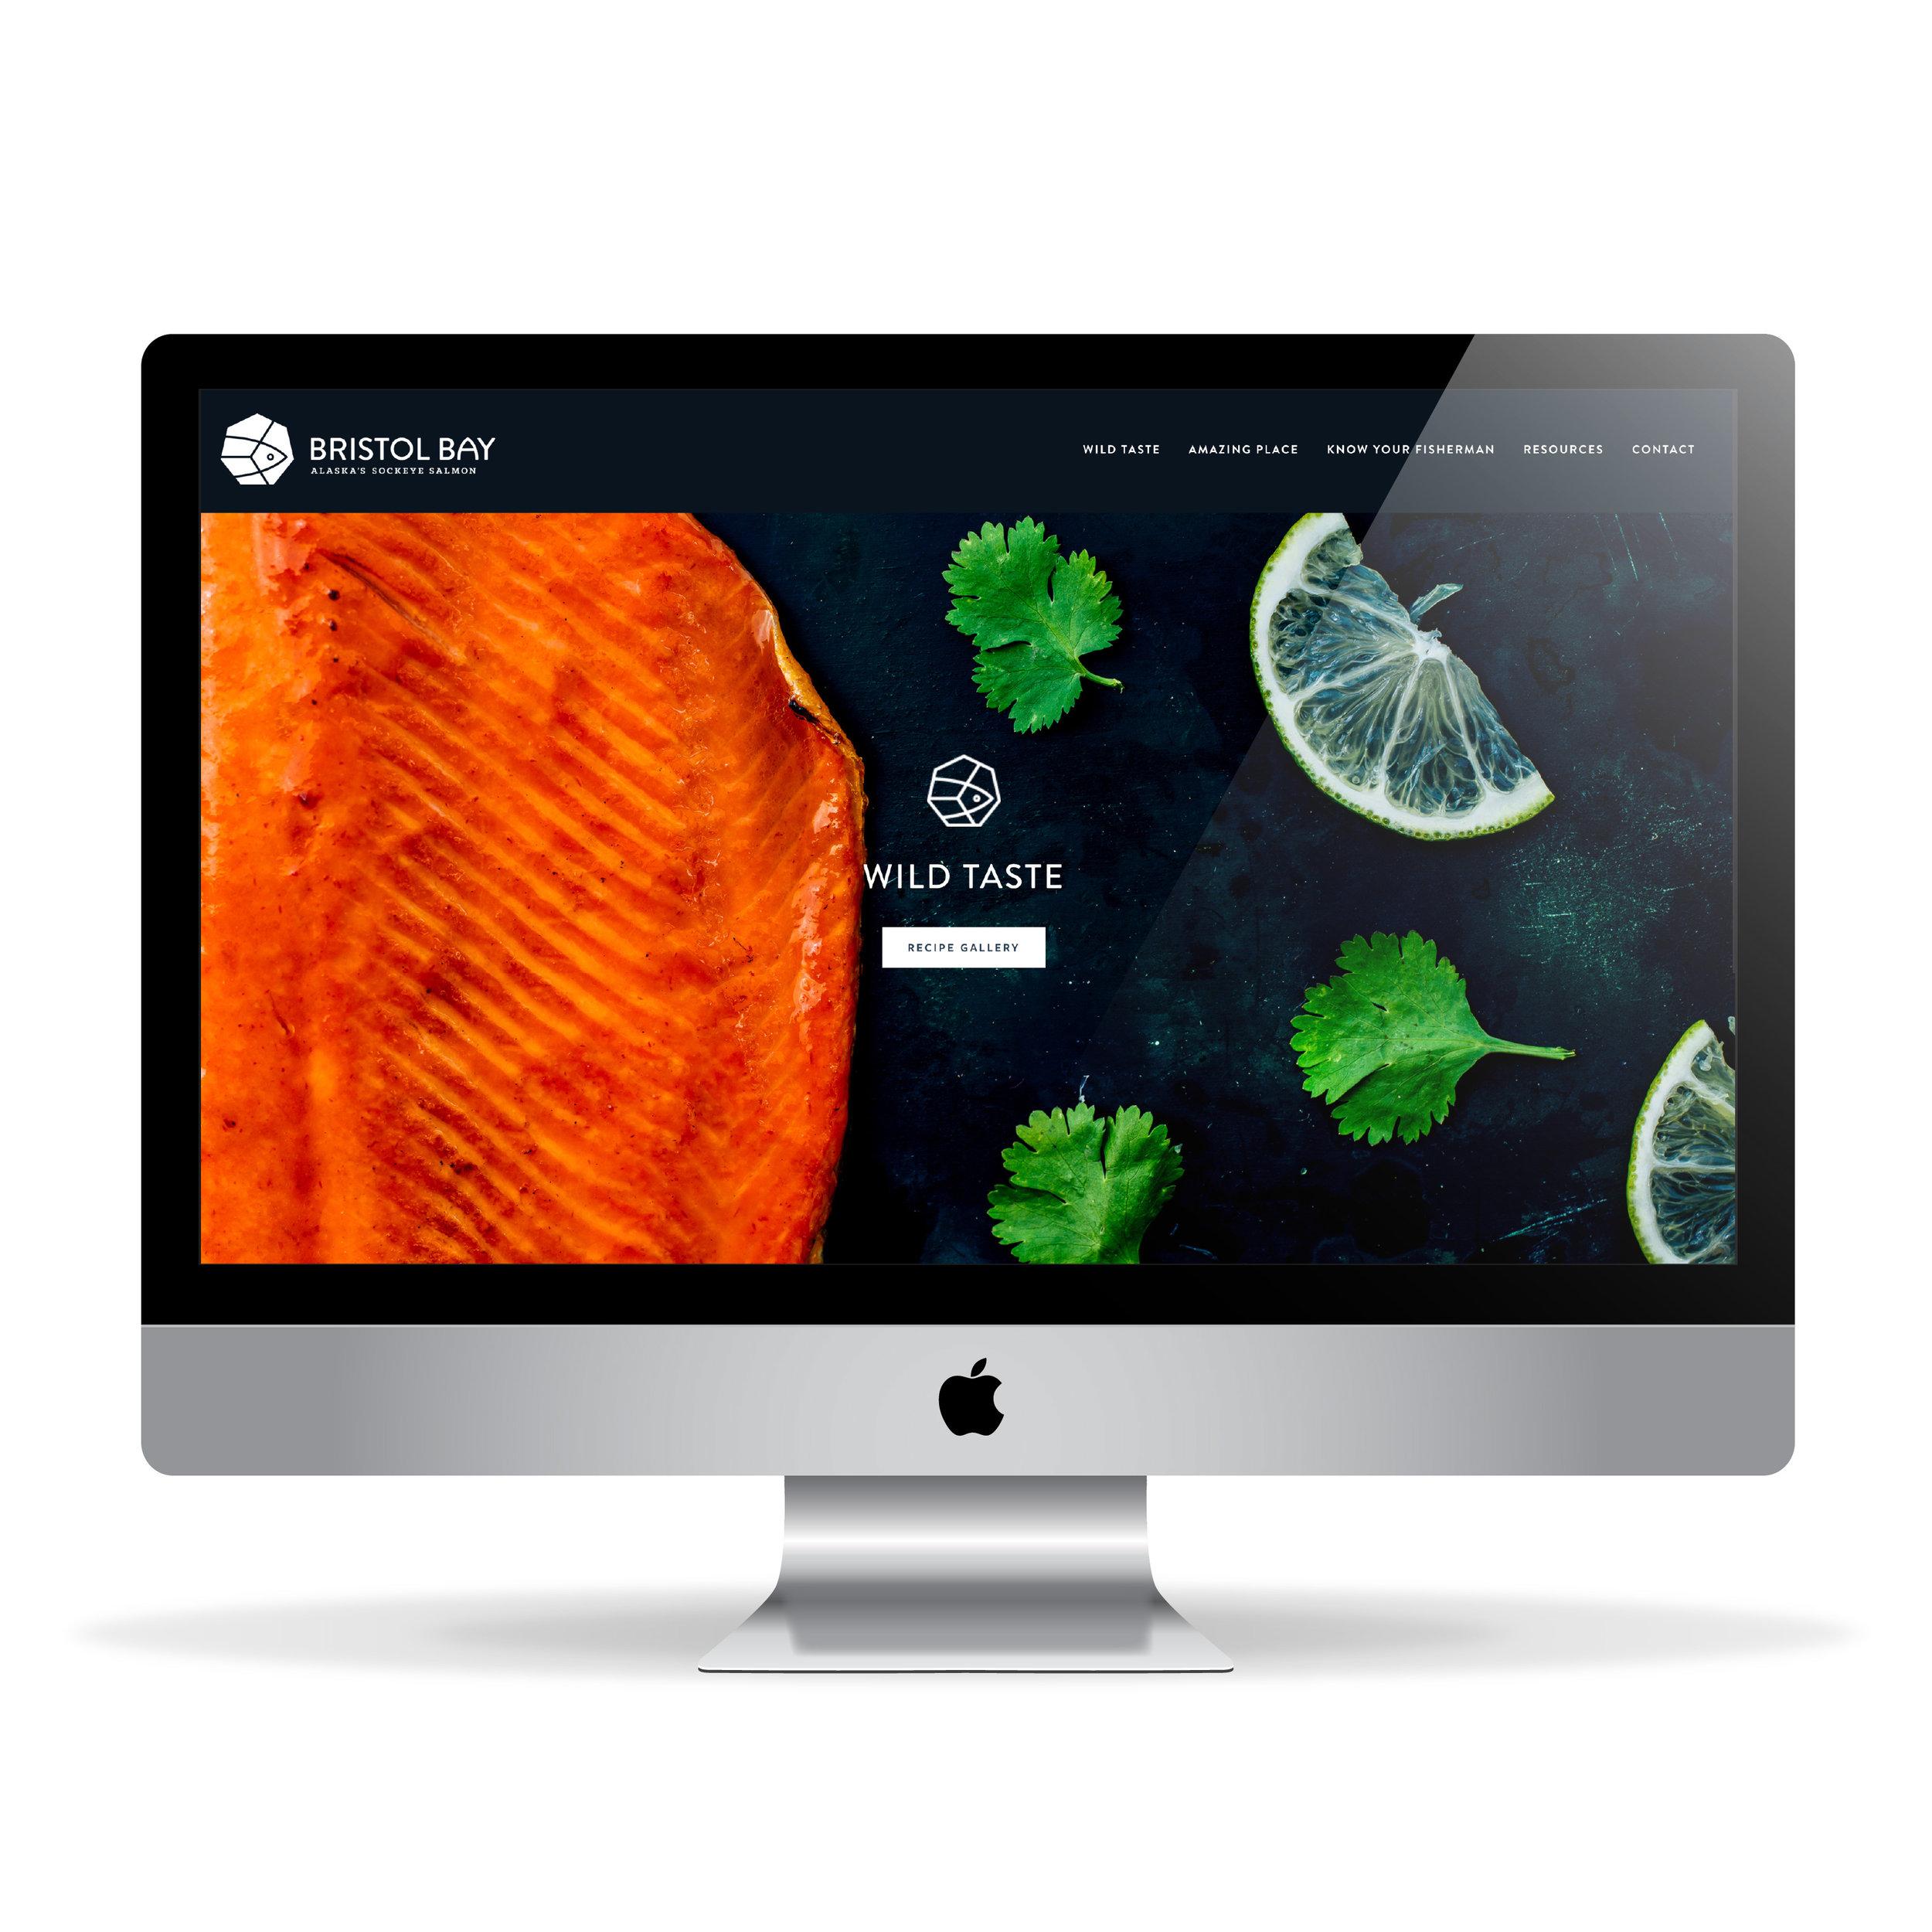 Apple-IMac-Mockup1-01.jpg